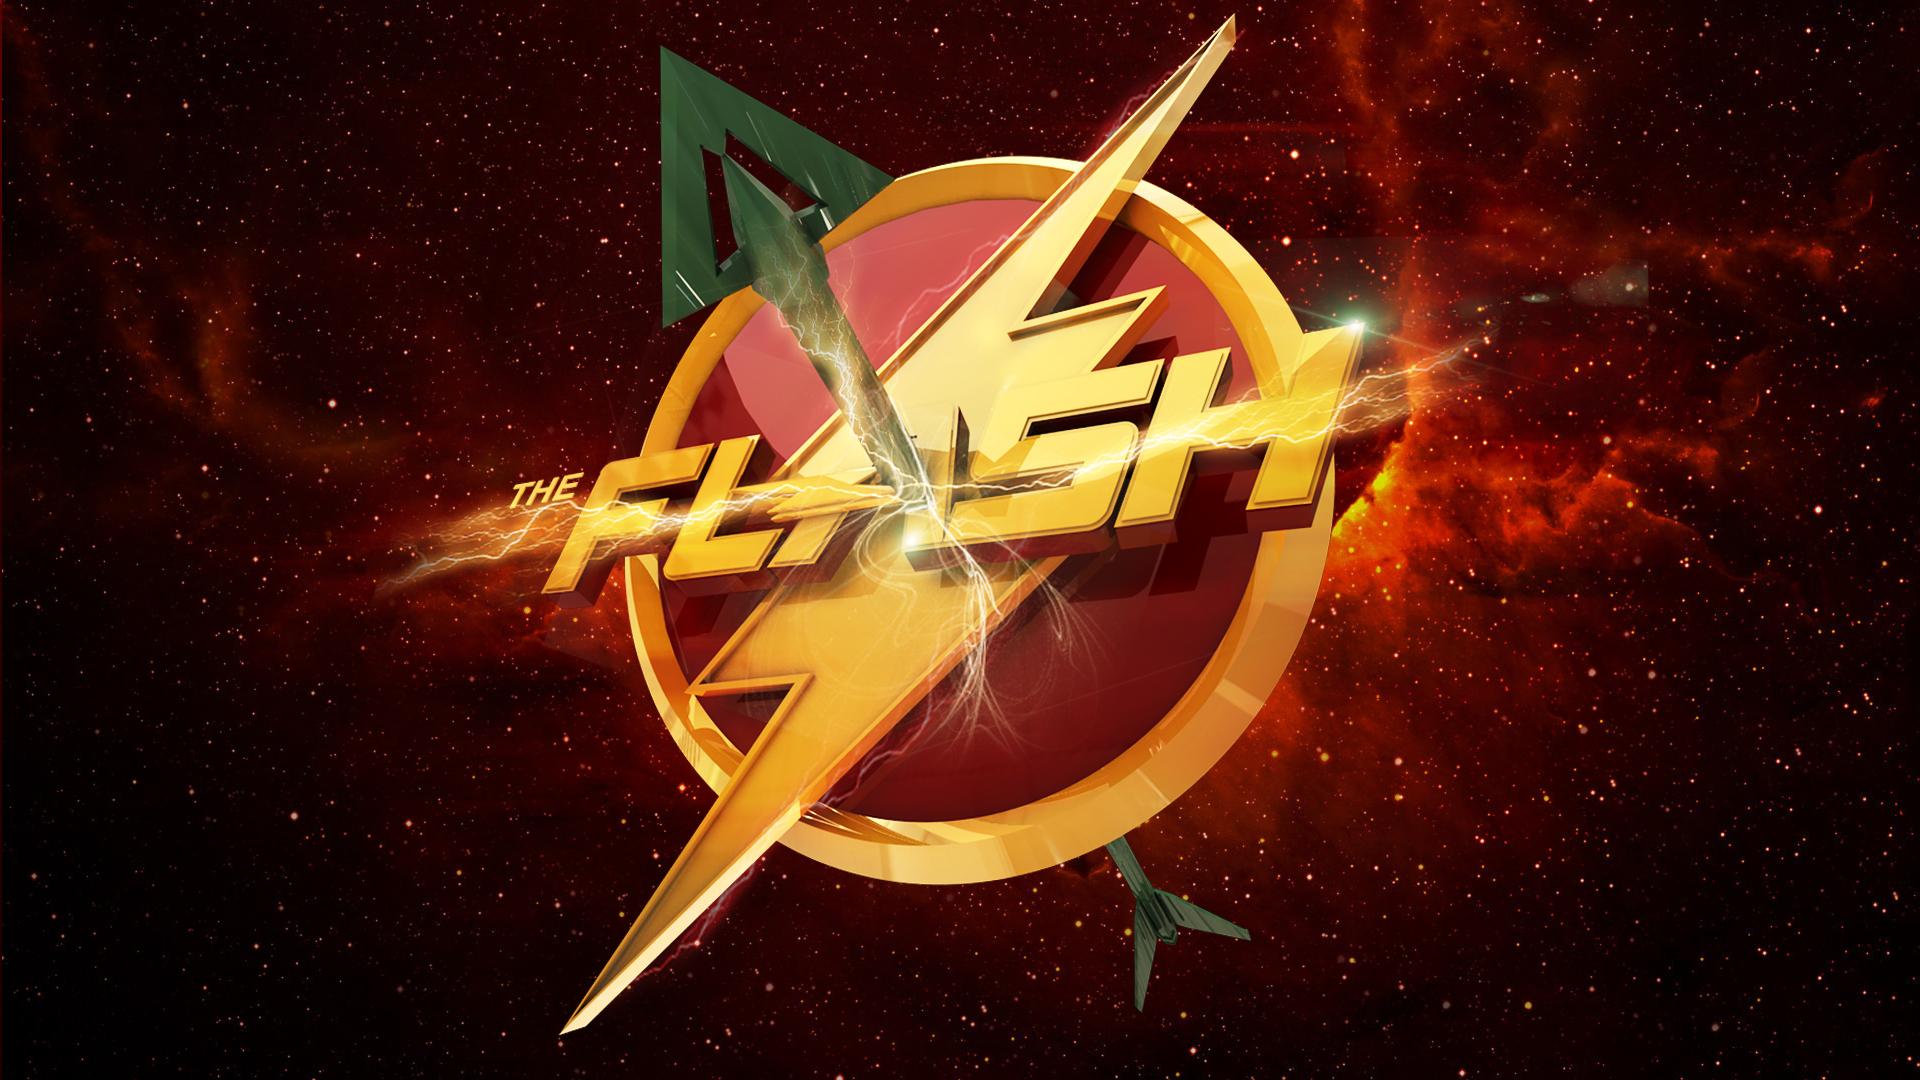 Green Arrow and Flash Wallpapers - WallpaperSafari The Flash Wallpaper